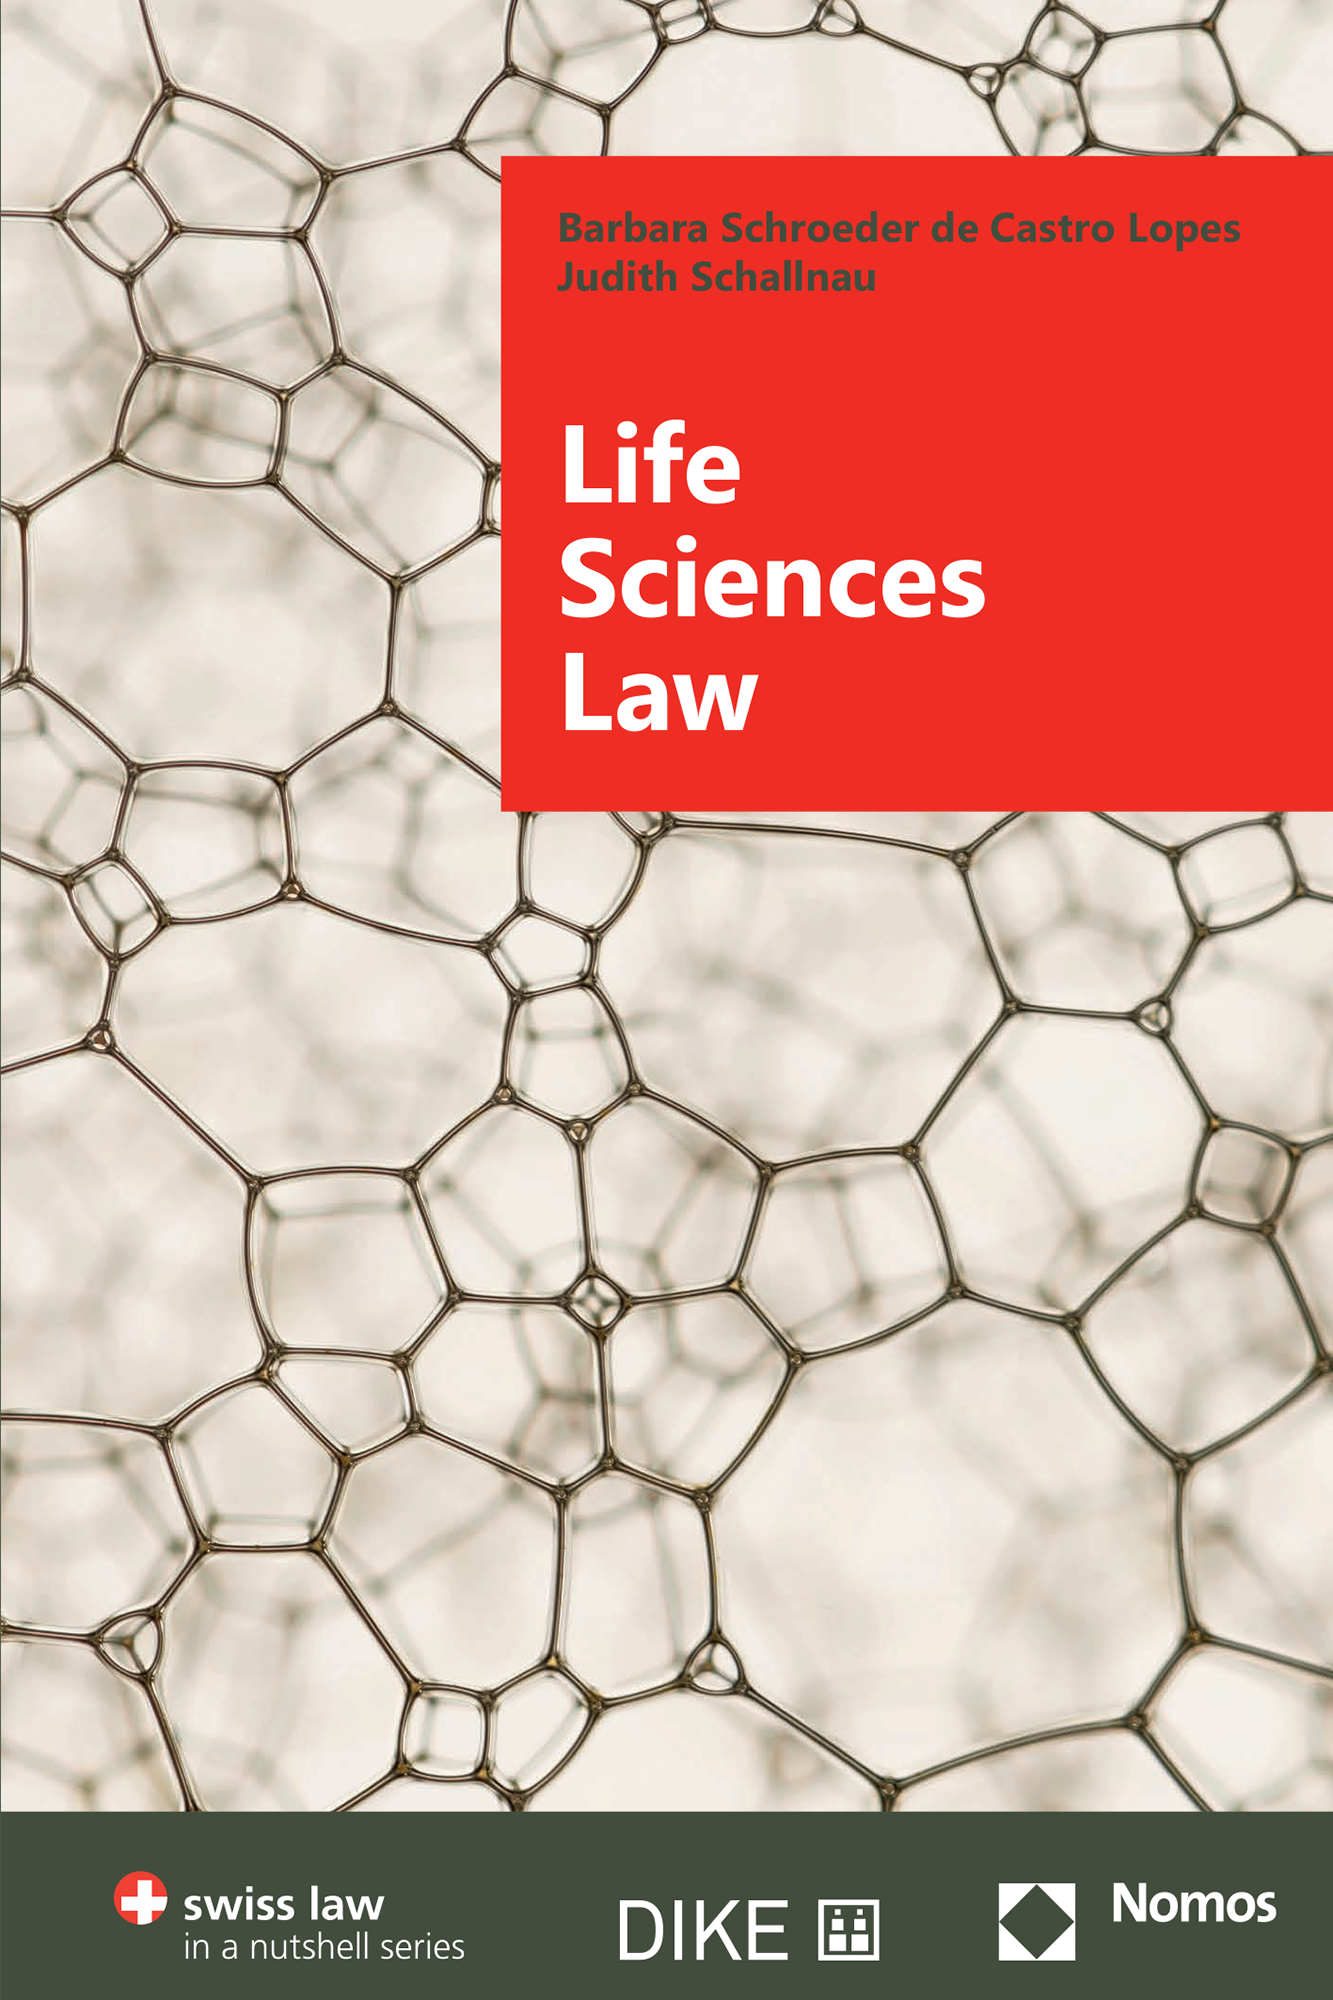 Life Sciences Law